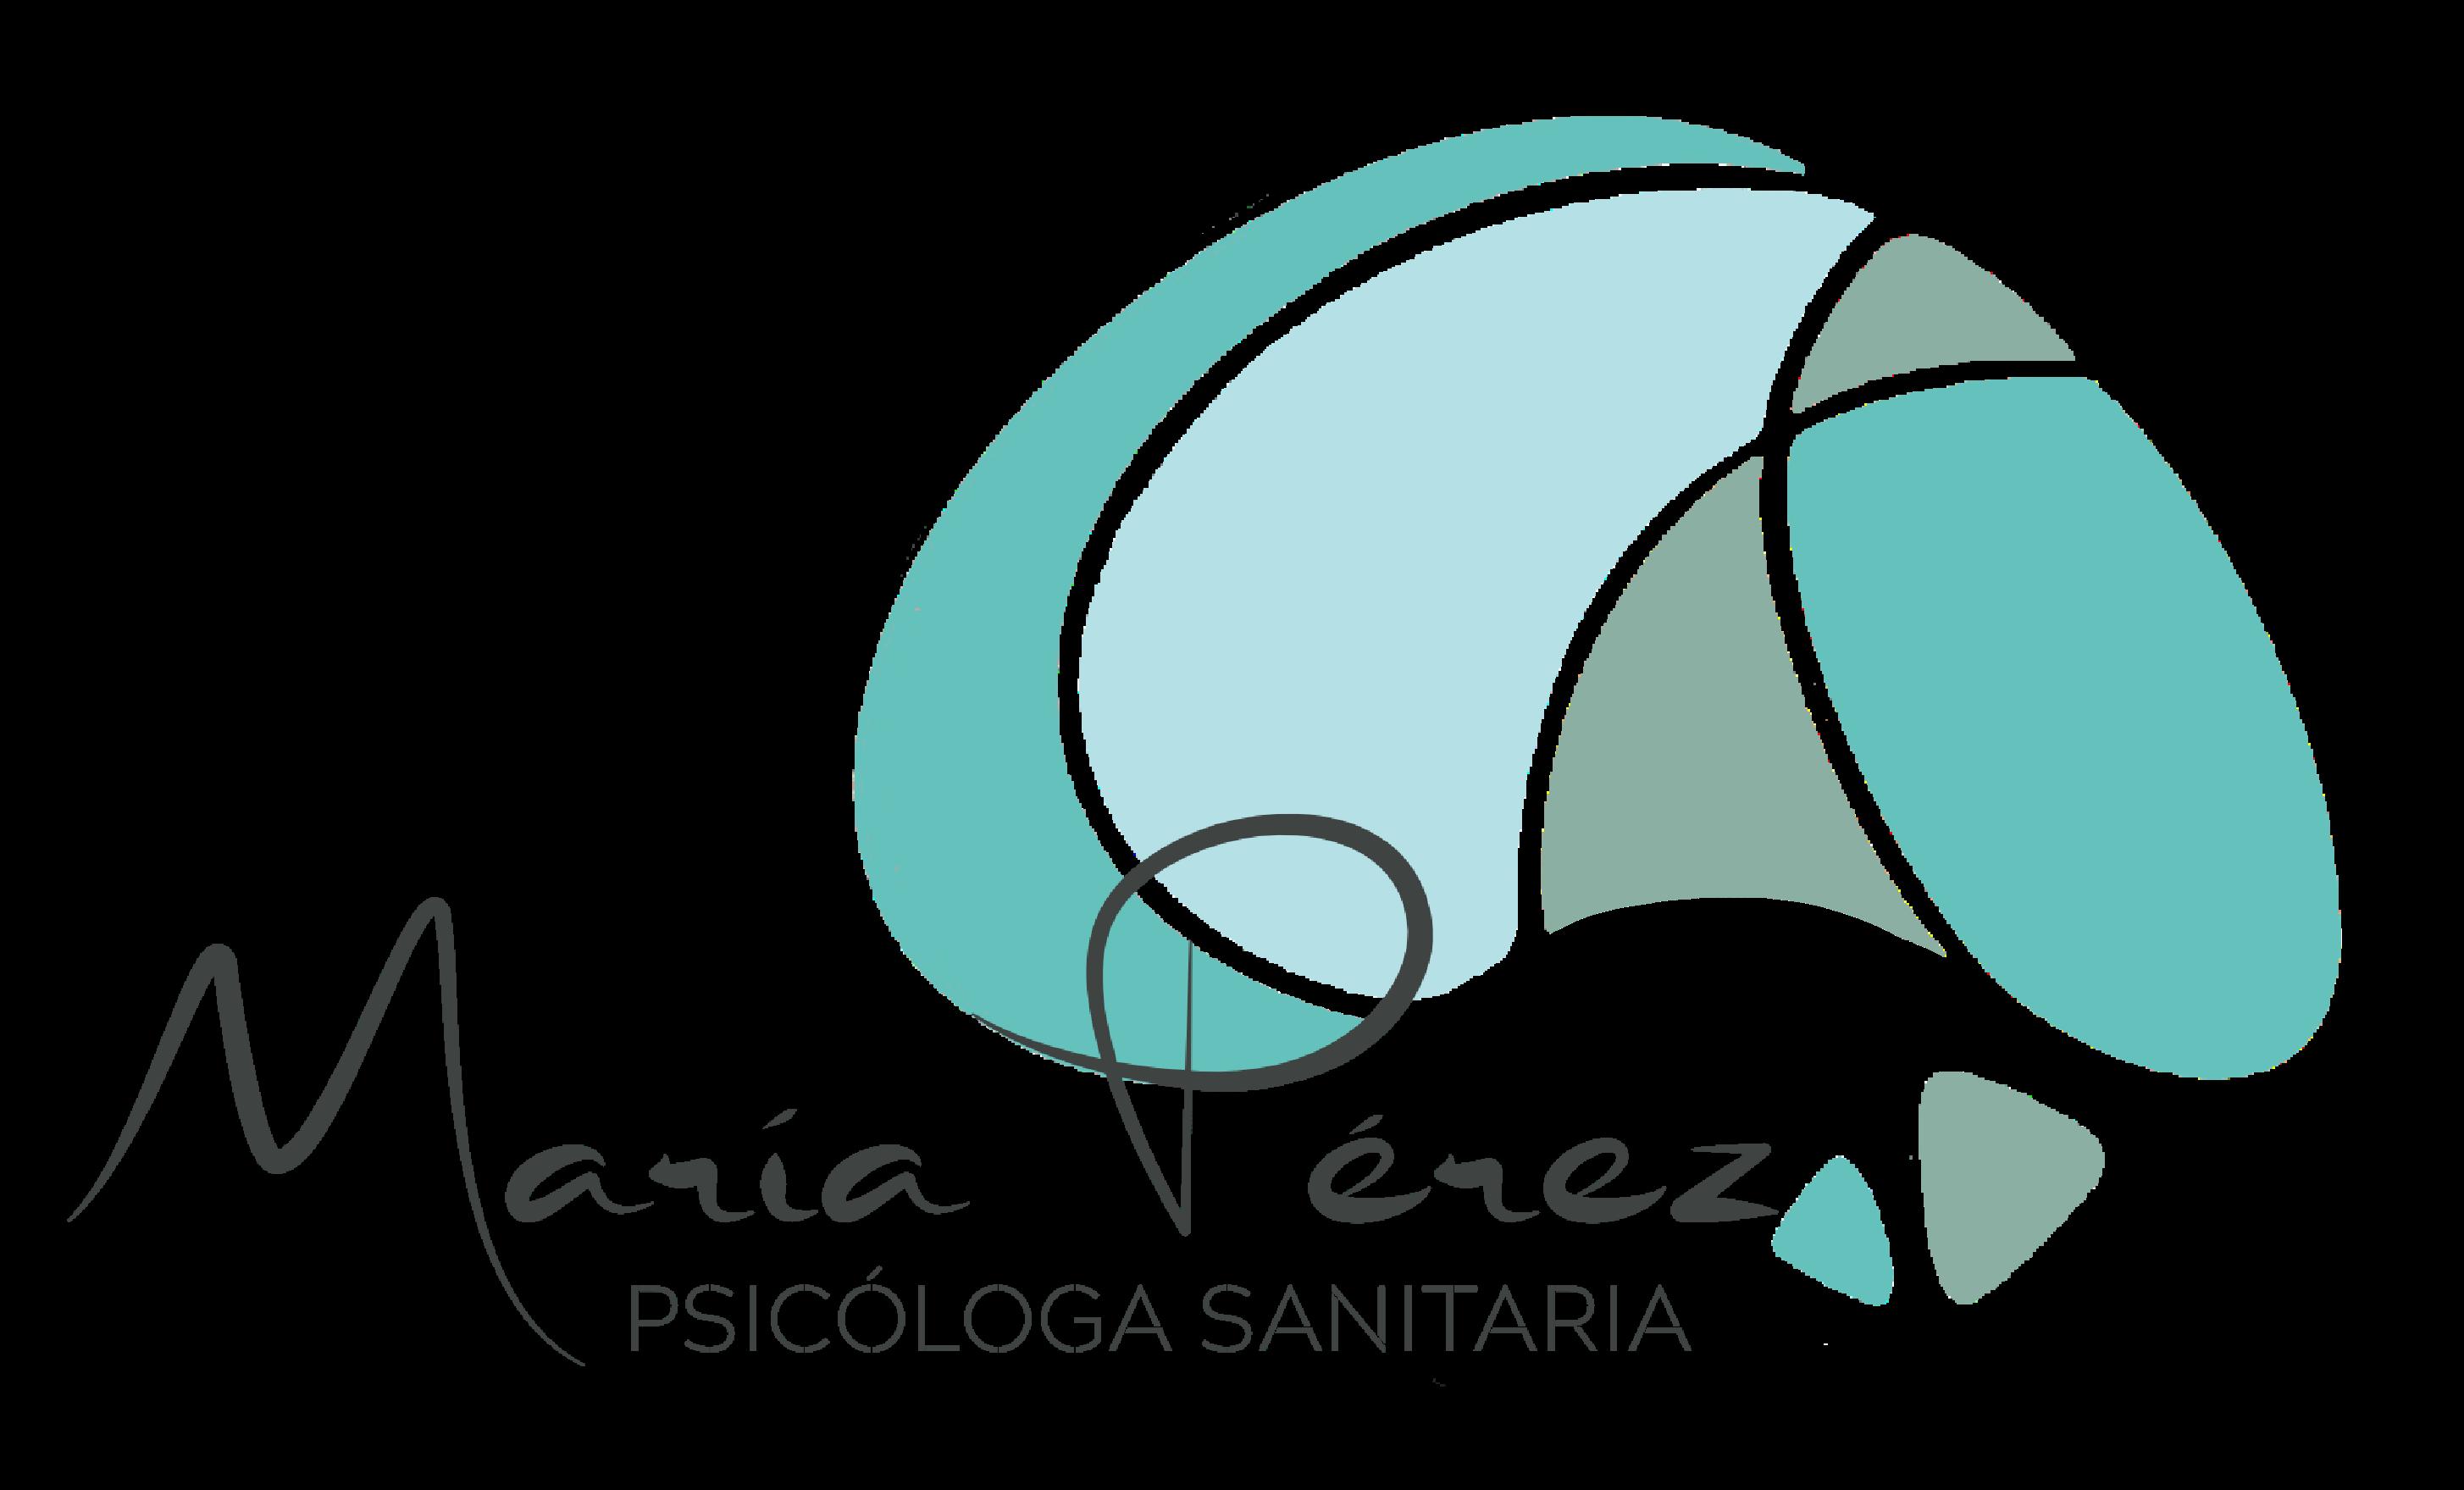 María Pérez Psicóloga